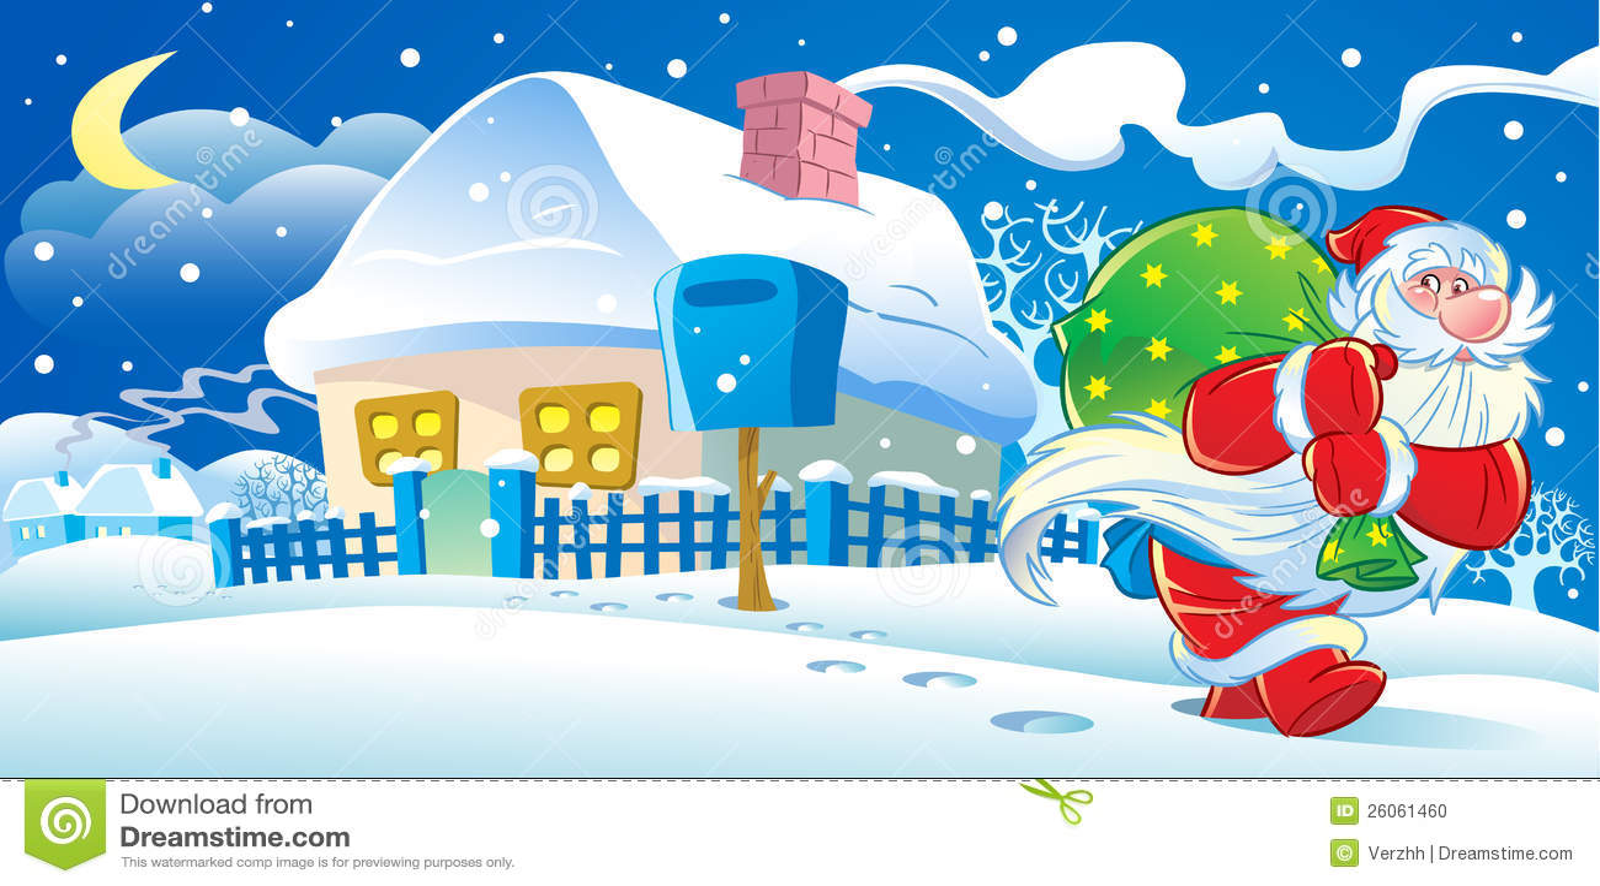 Santa Claus New Years Eve Stock Photo Image 26061460